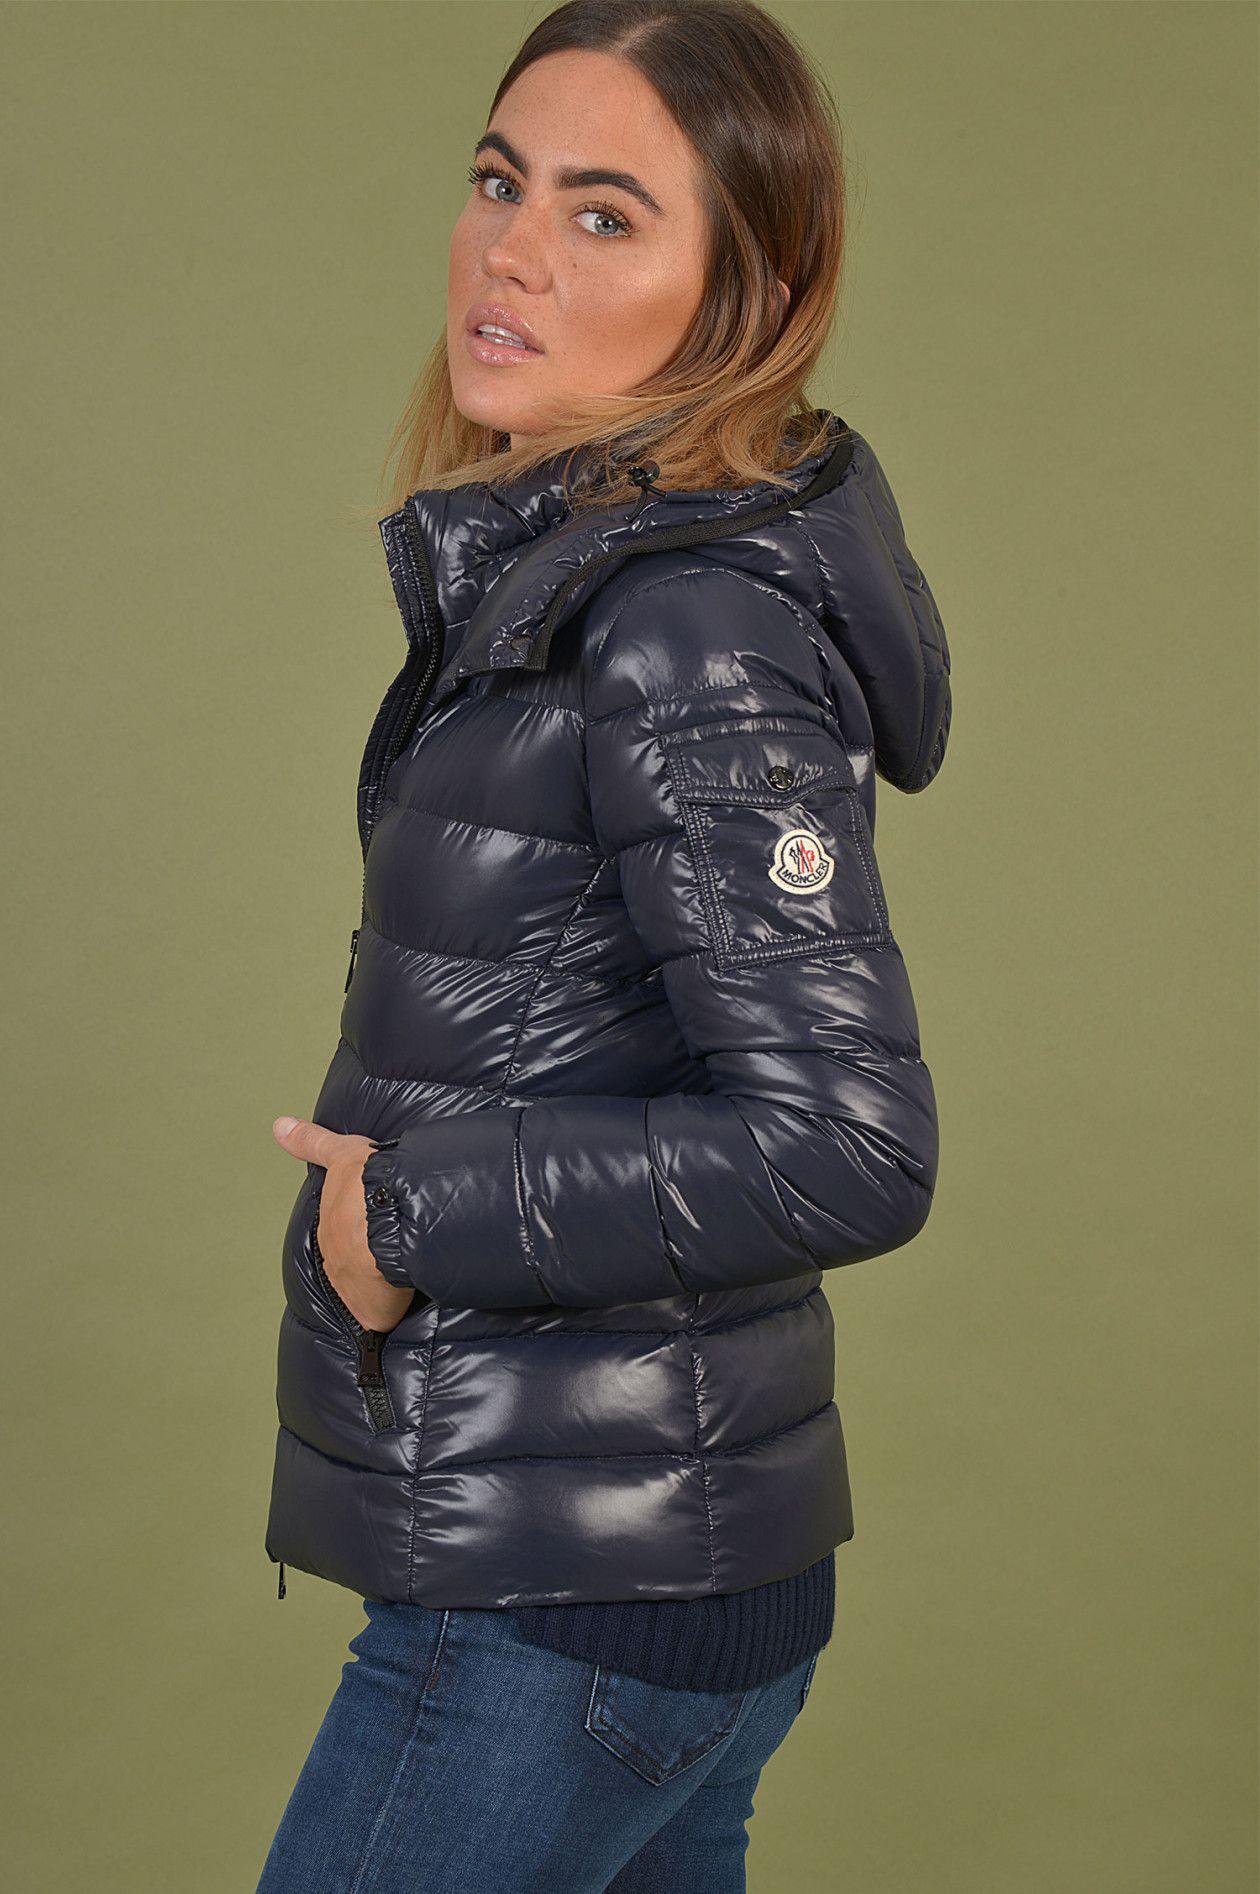 low priced 744fa 3f7bf Daunenjacke BADY in Marine | Moncler | Moncler, Winter ...